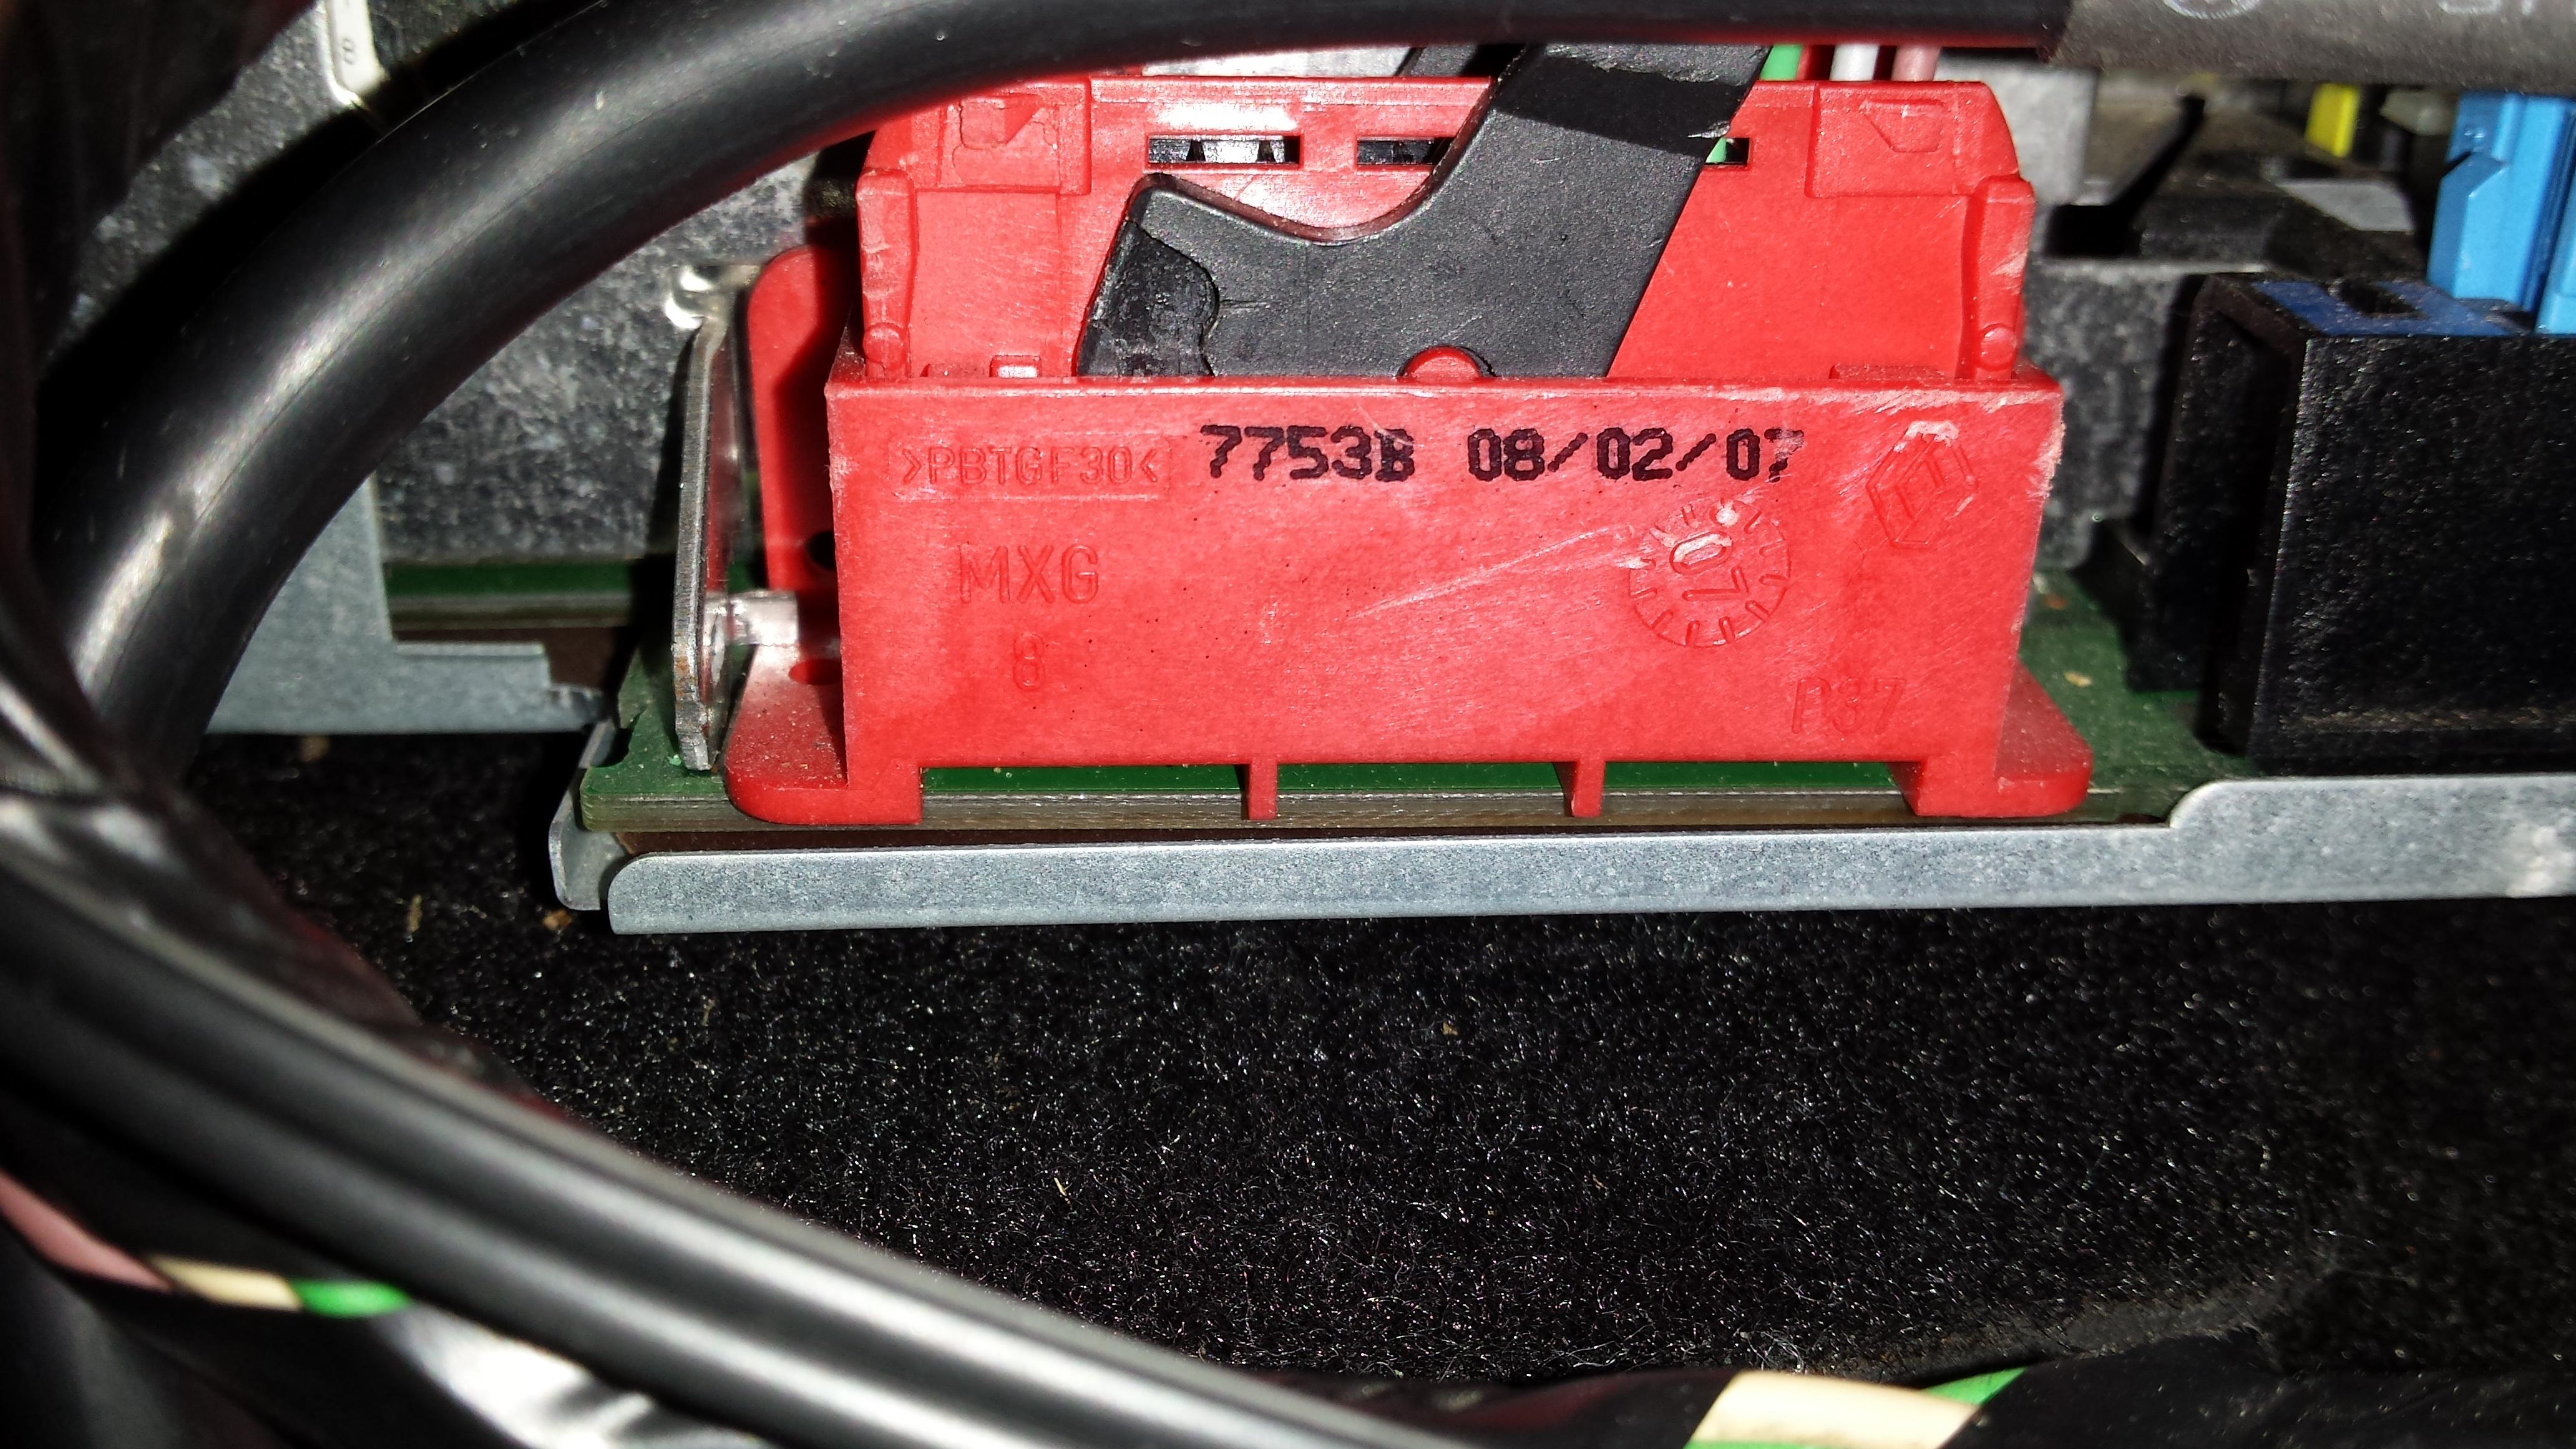 Cabasse/ no. RENRAT 121-52 - szukam Schemat kostek do radia Cabasse do Renault